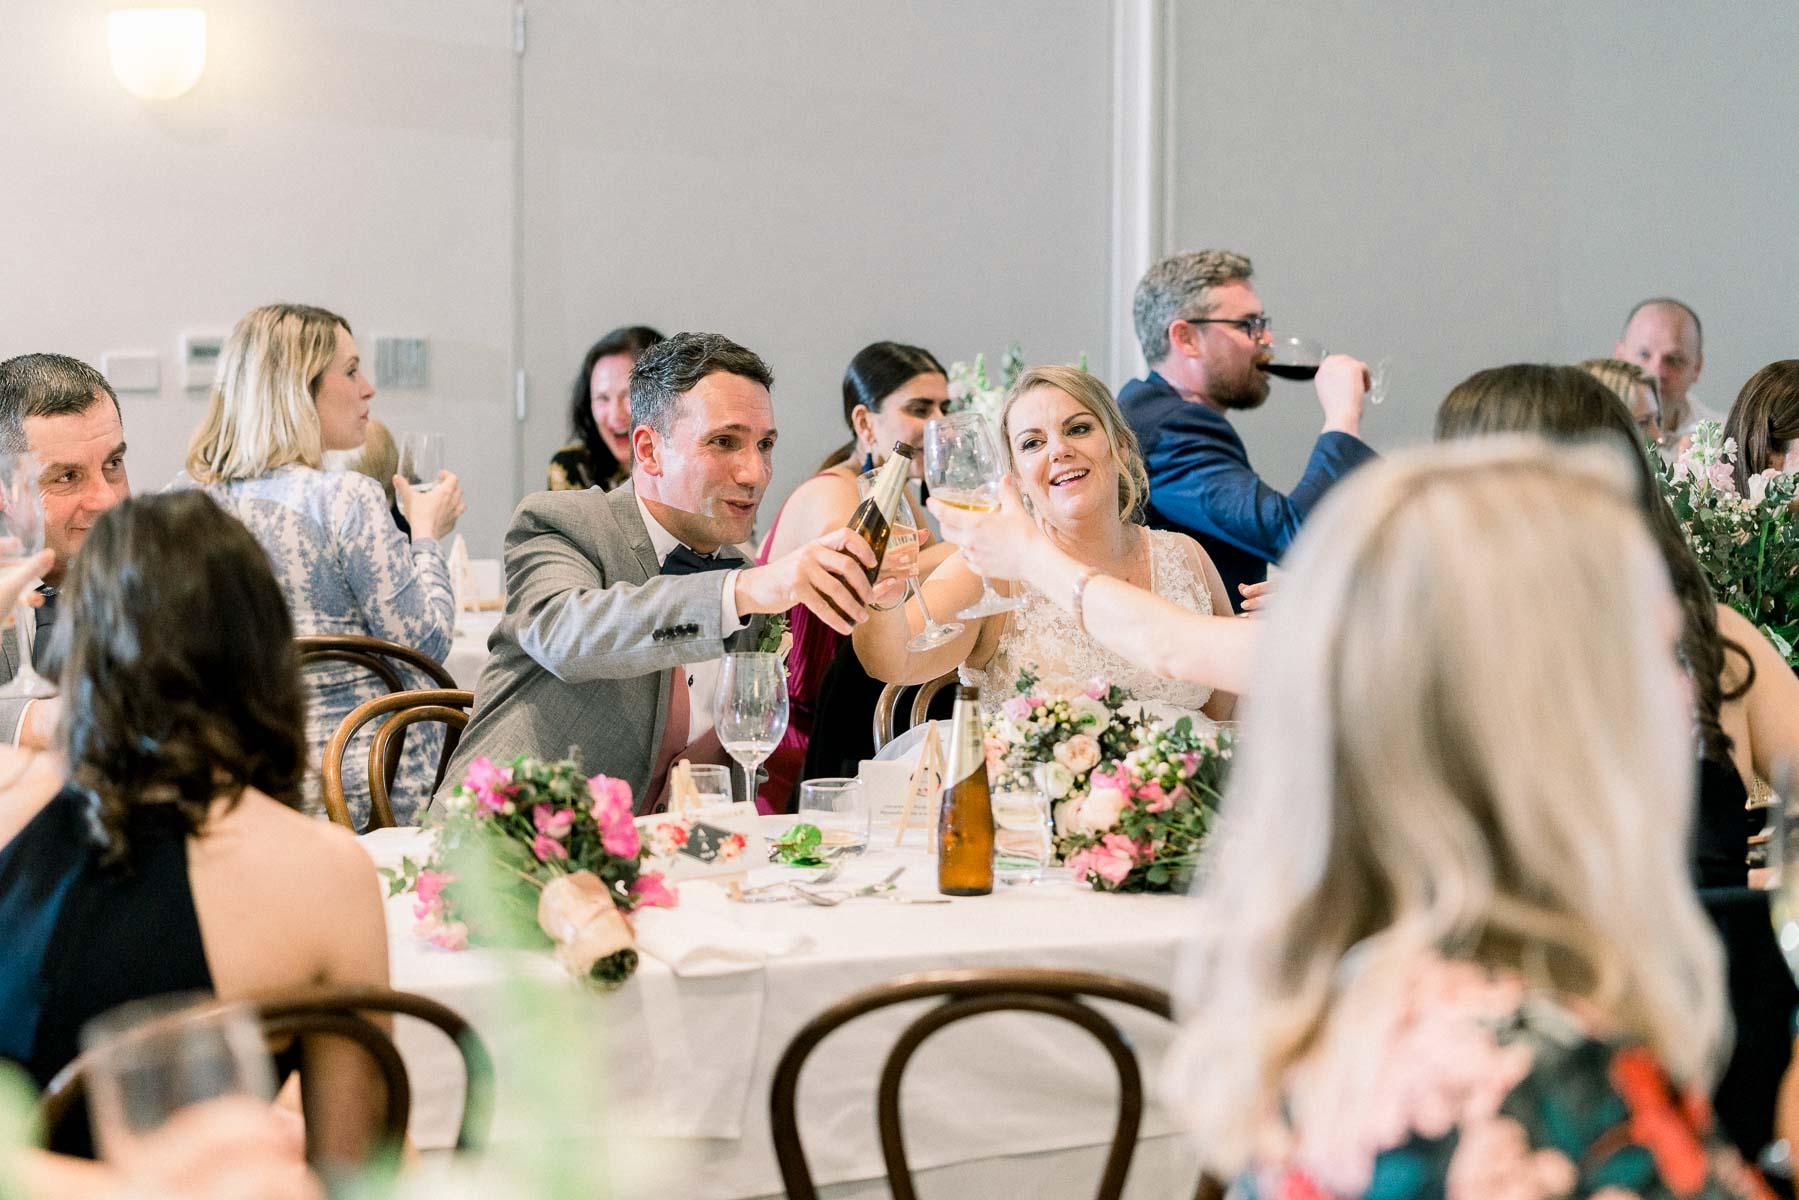 lindenderry-wedding-heart+soul-weddings-amy-alain-04100.jpg